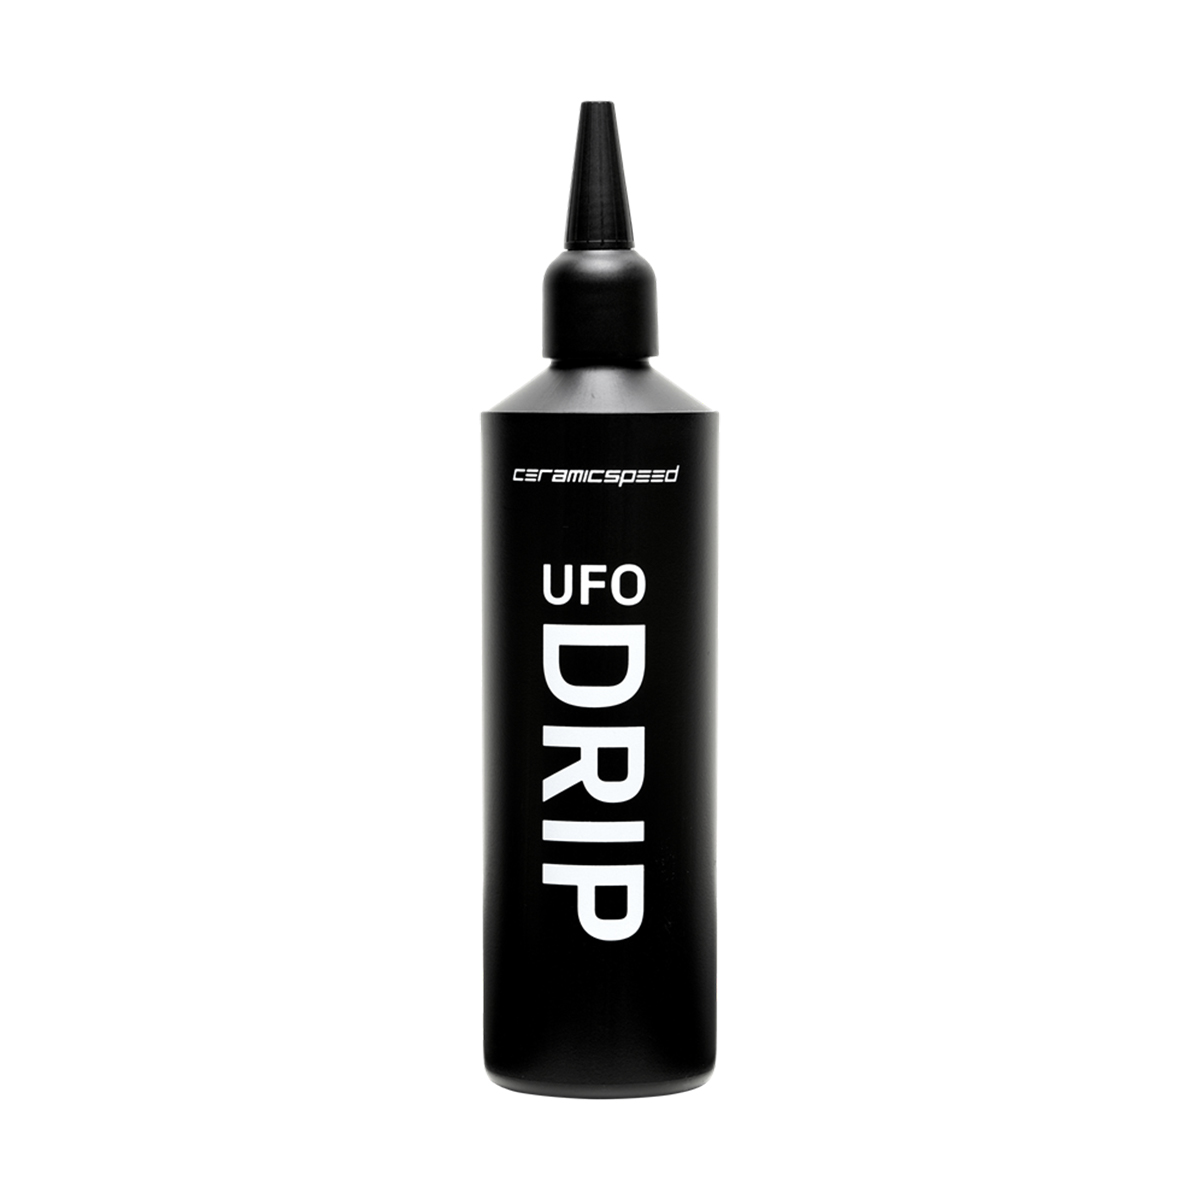 ENDUIT CERAMIC SPEED UFO - 180ML